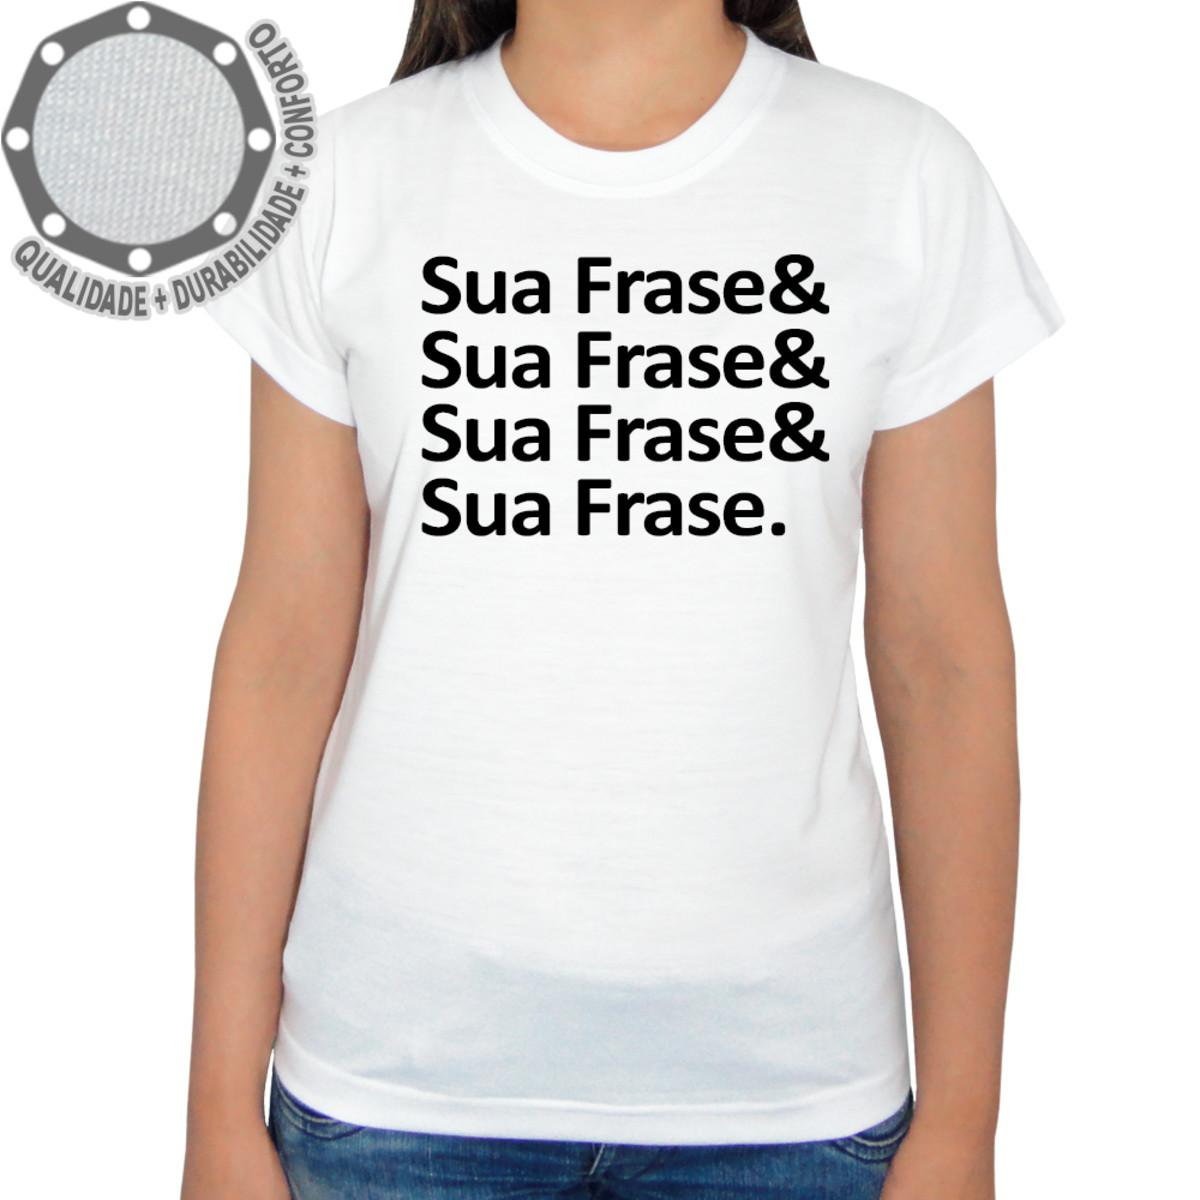 Camiseta Sua Frase Camisa Frases Ah01451